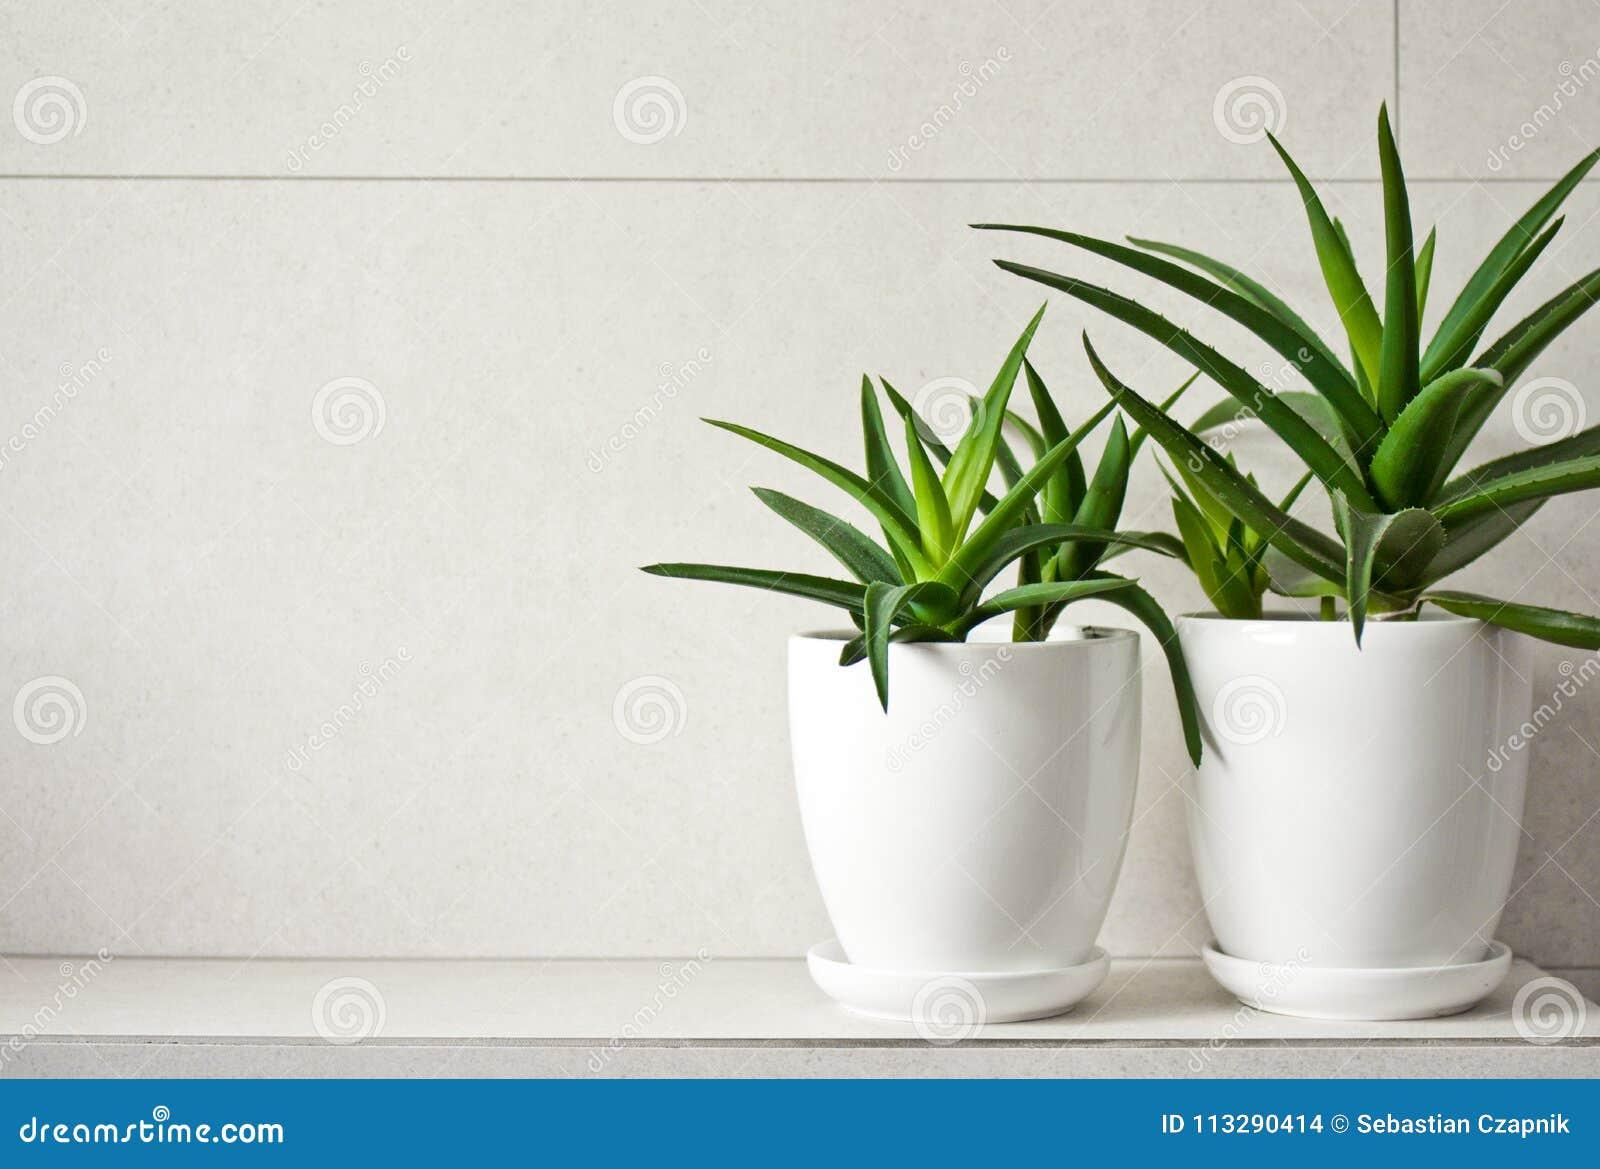 Medical herb aloe vera in pots on bathroom shelf